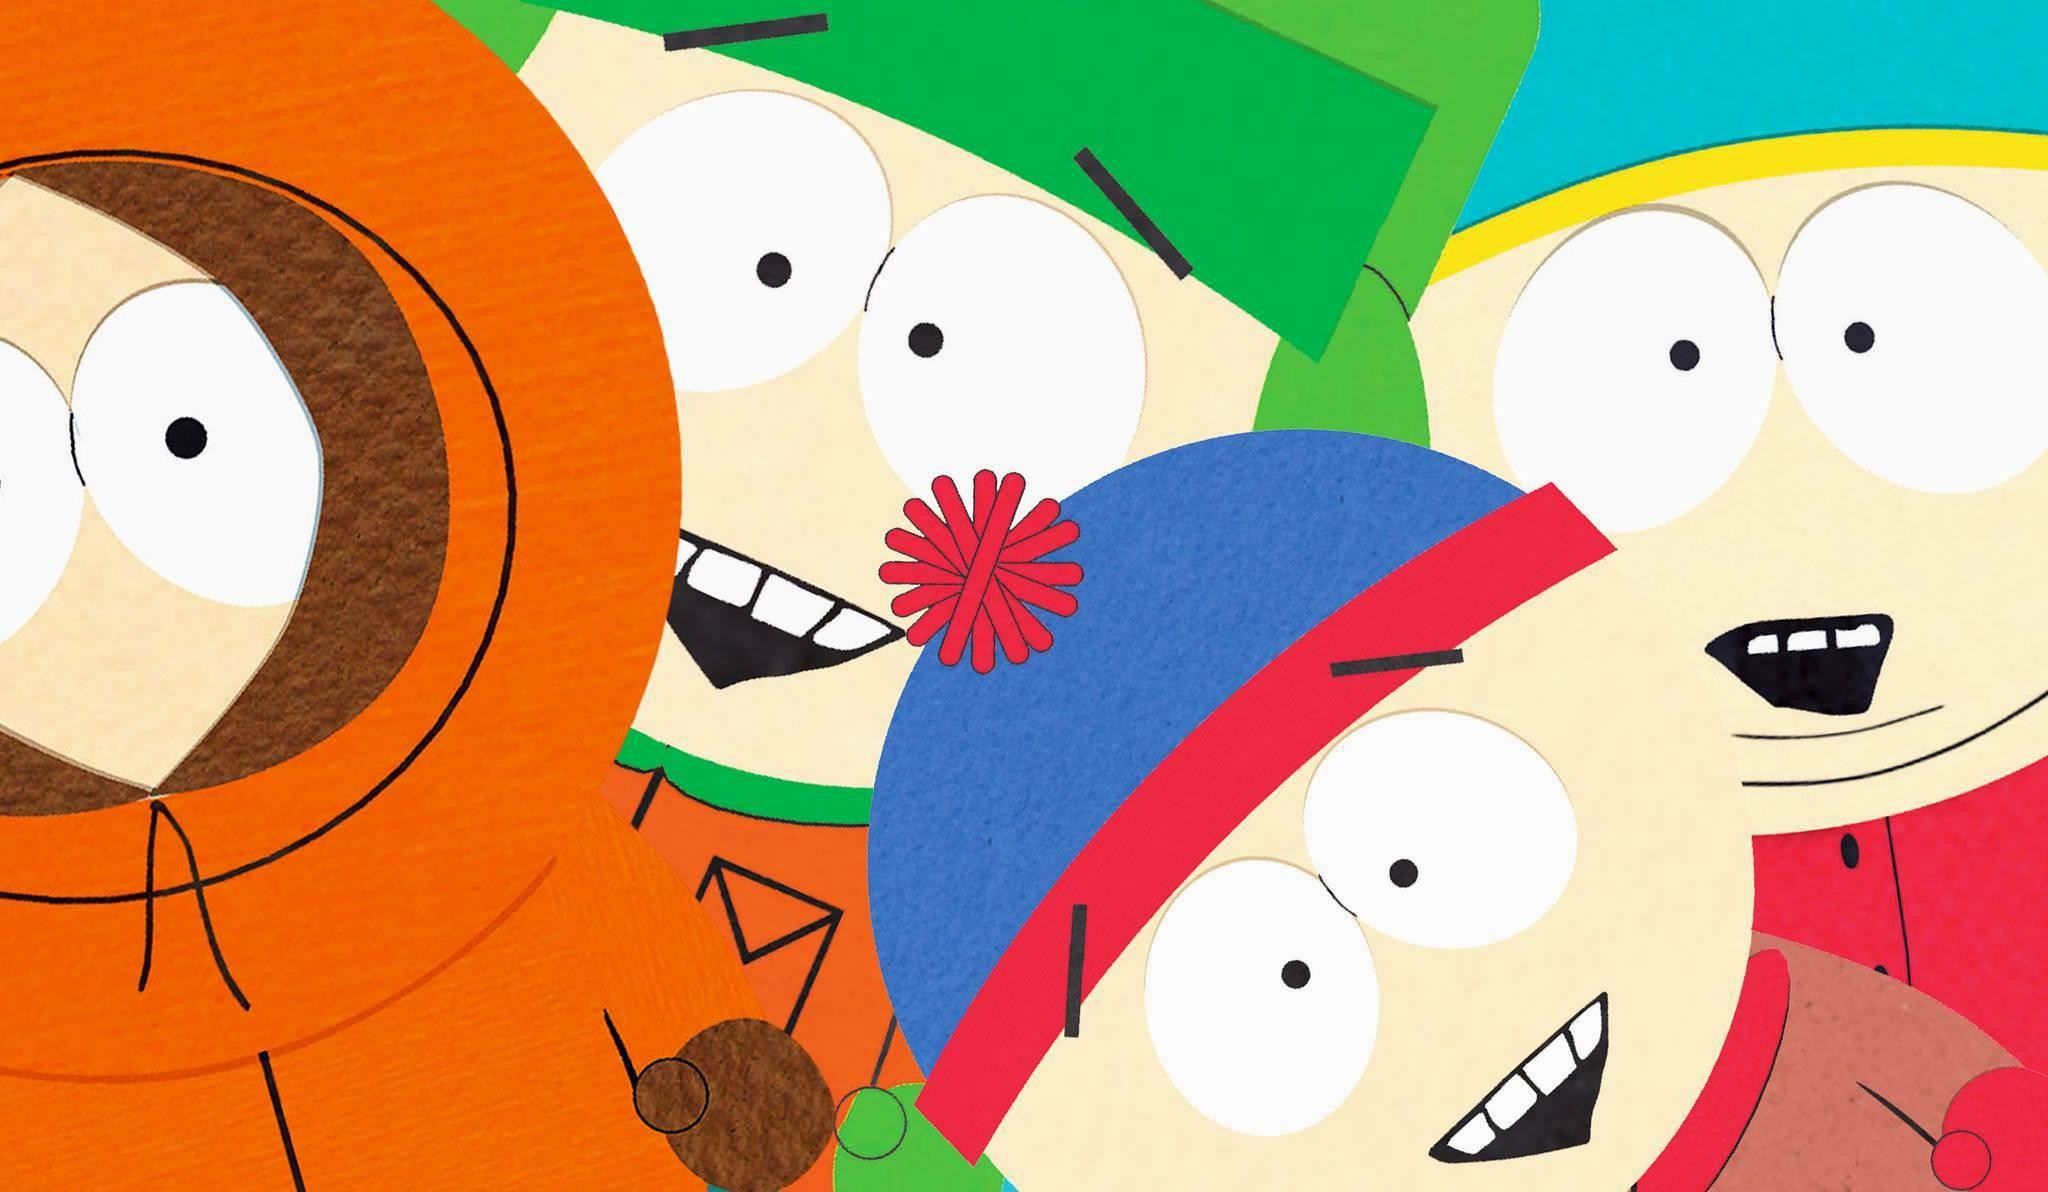 South Park Backgrounds 1